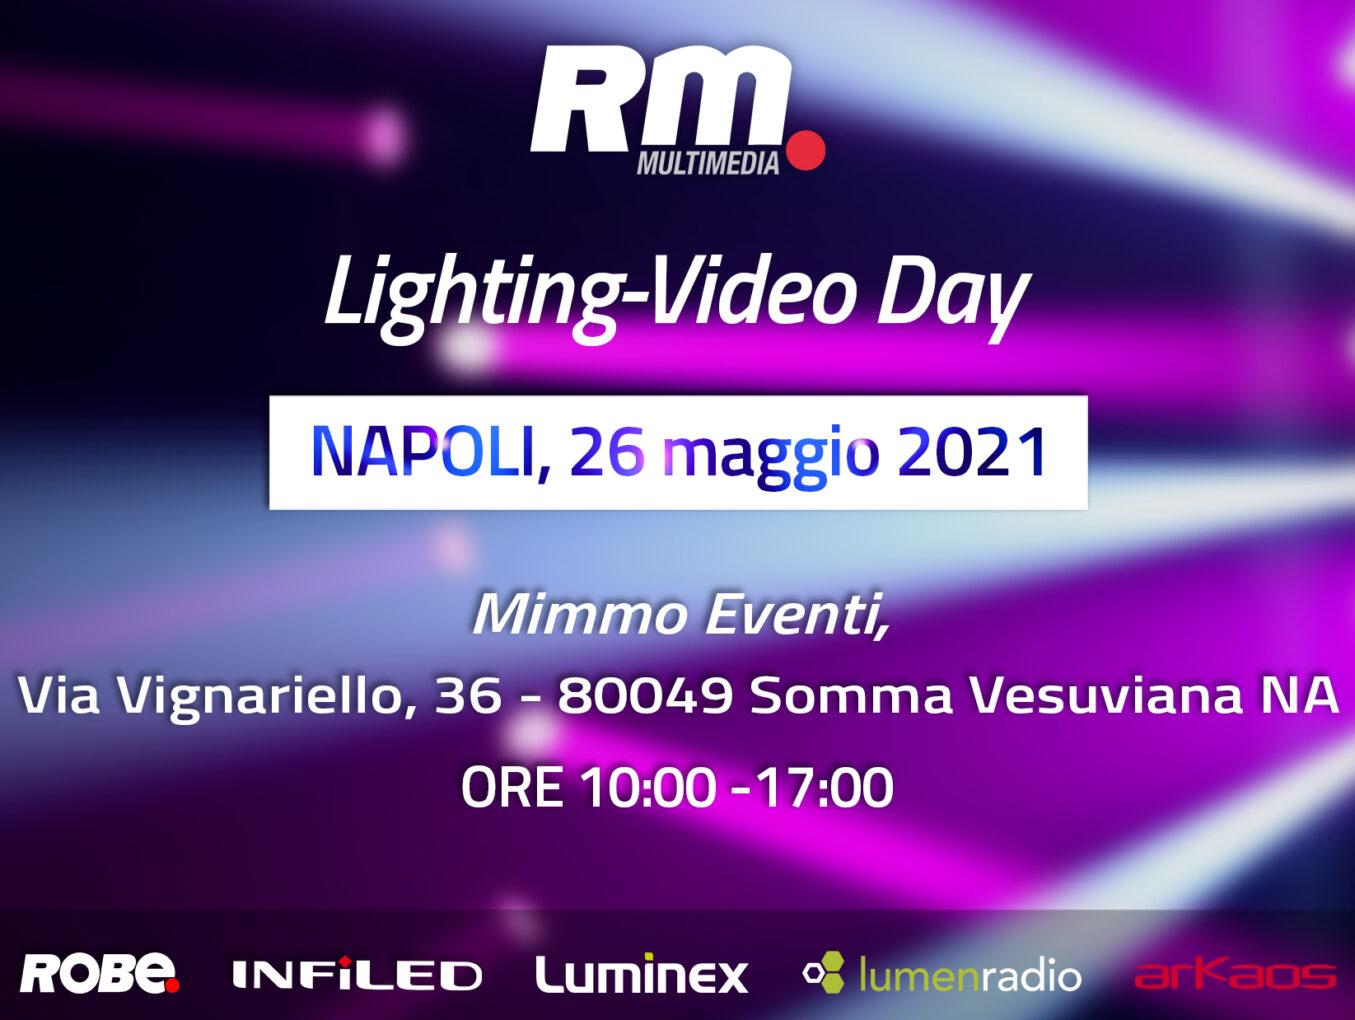 Roadshow Lighting-Video Day 2021: tappa a Napoli